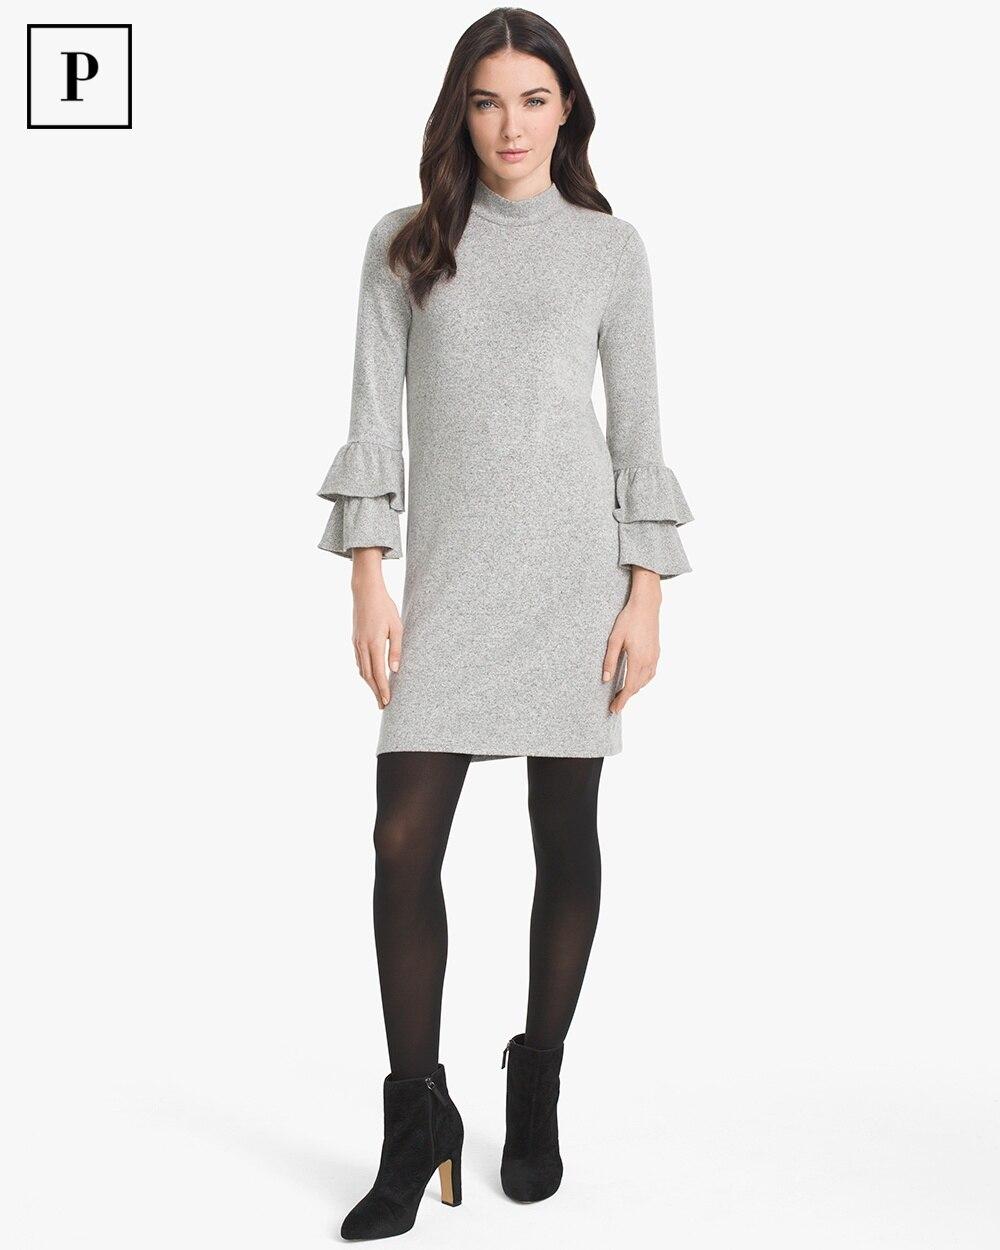 Petite Tiered Sleeve Sweater Dress White House Black Market